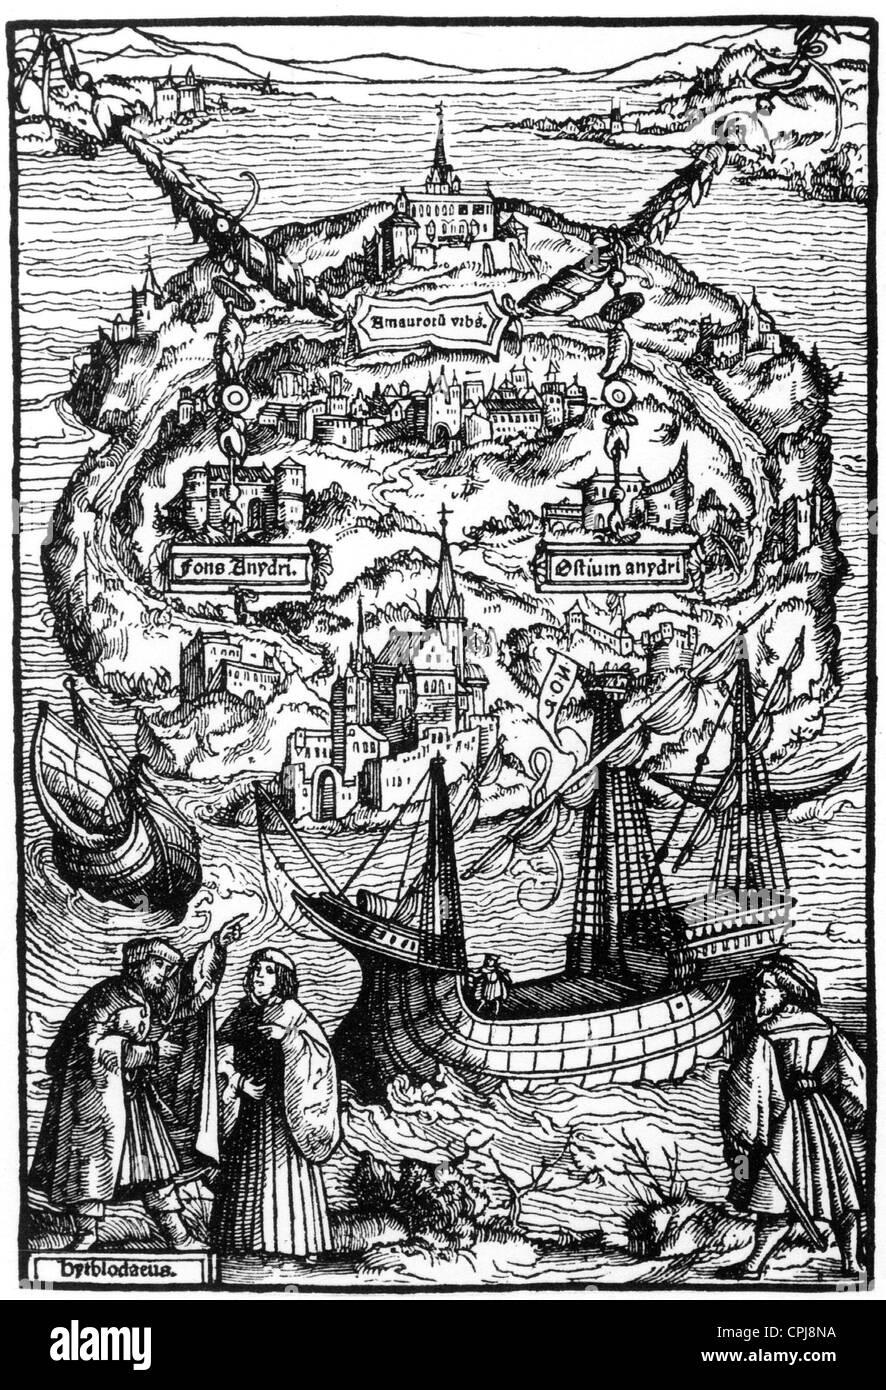 Titelholzschnitt zu dem Buch 'Utopia', 1516 - Stock Image